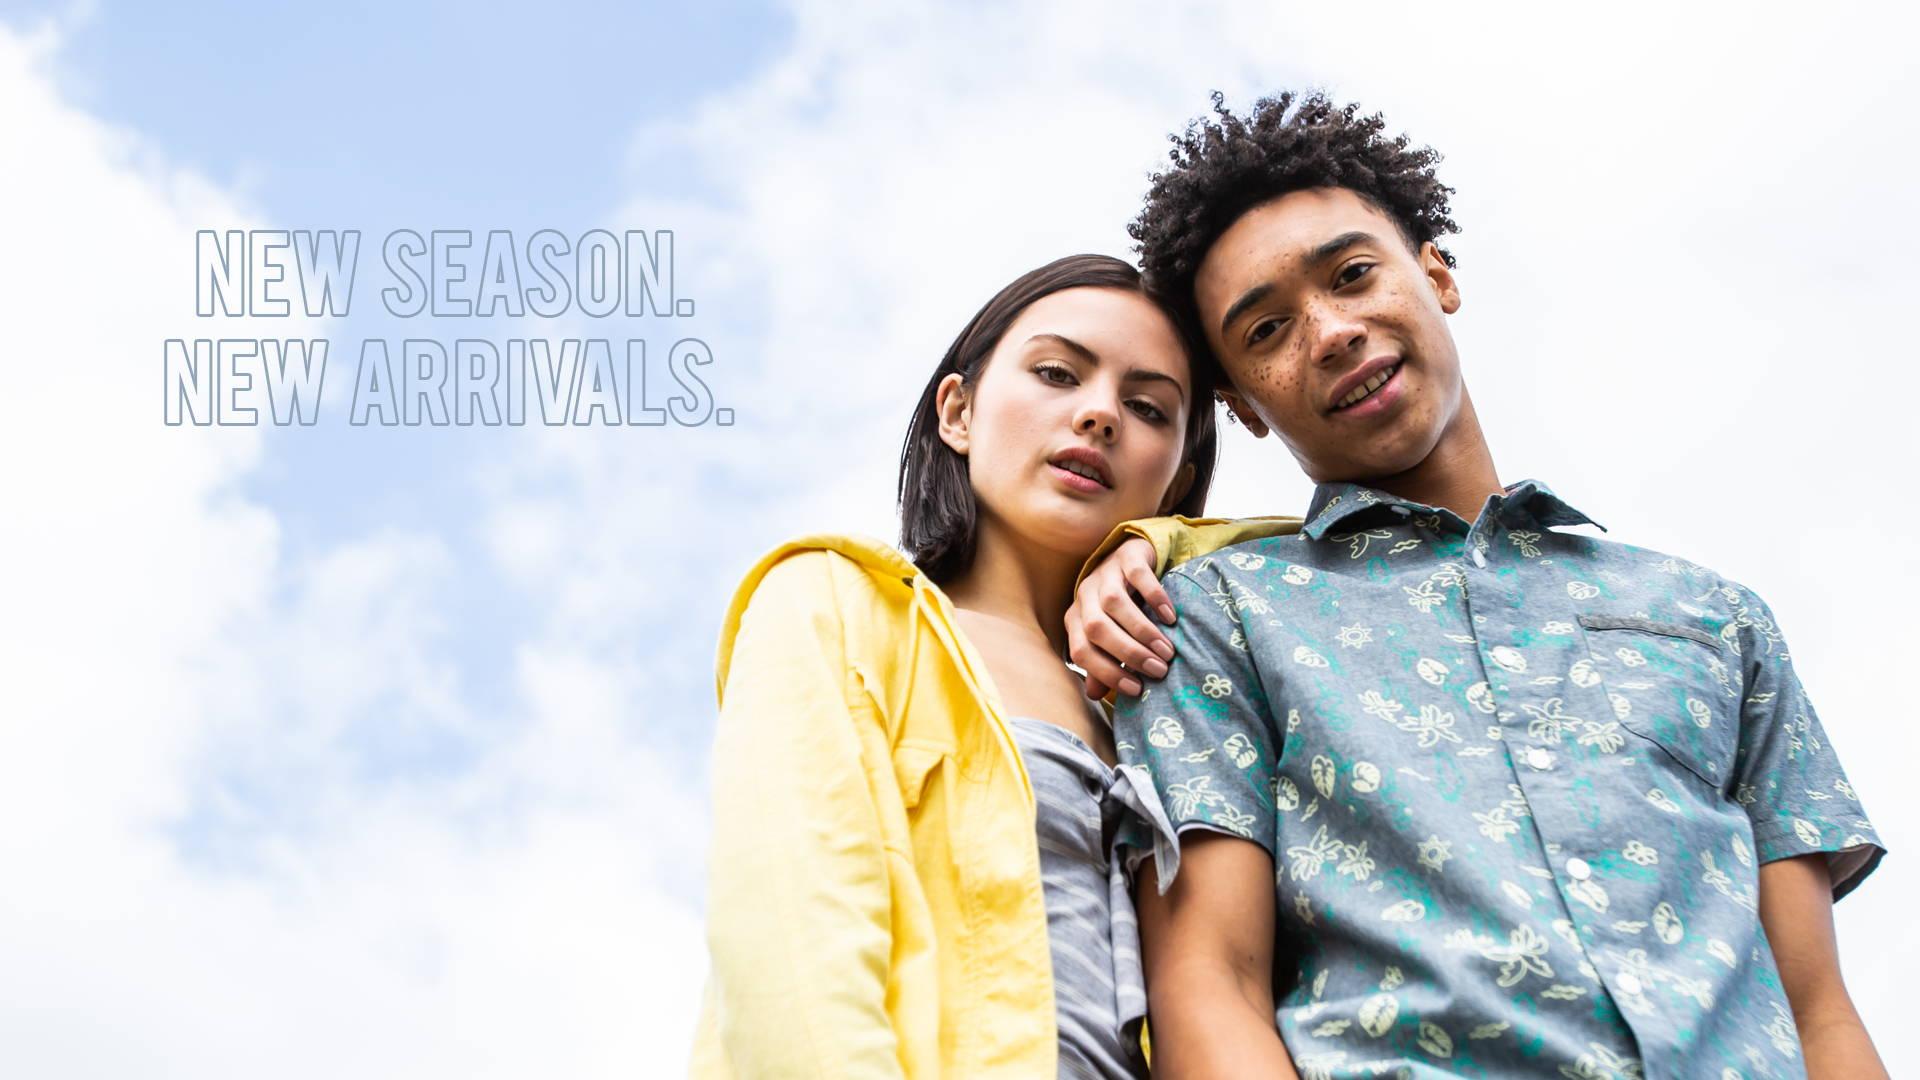 Girl wearing yellow jacket and man wearing blue button shirt